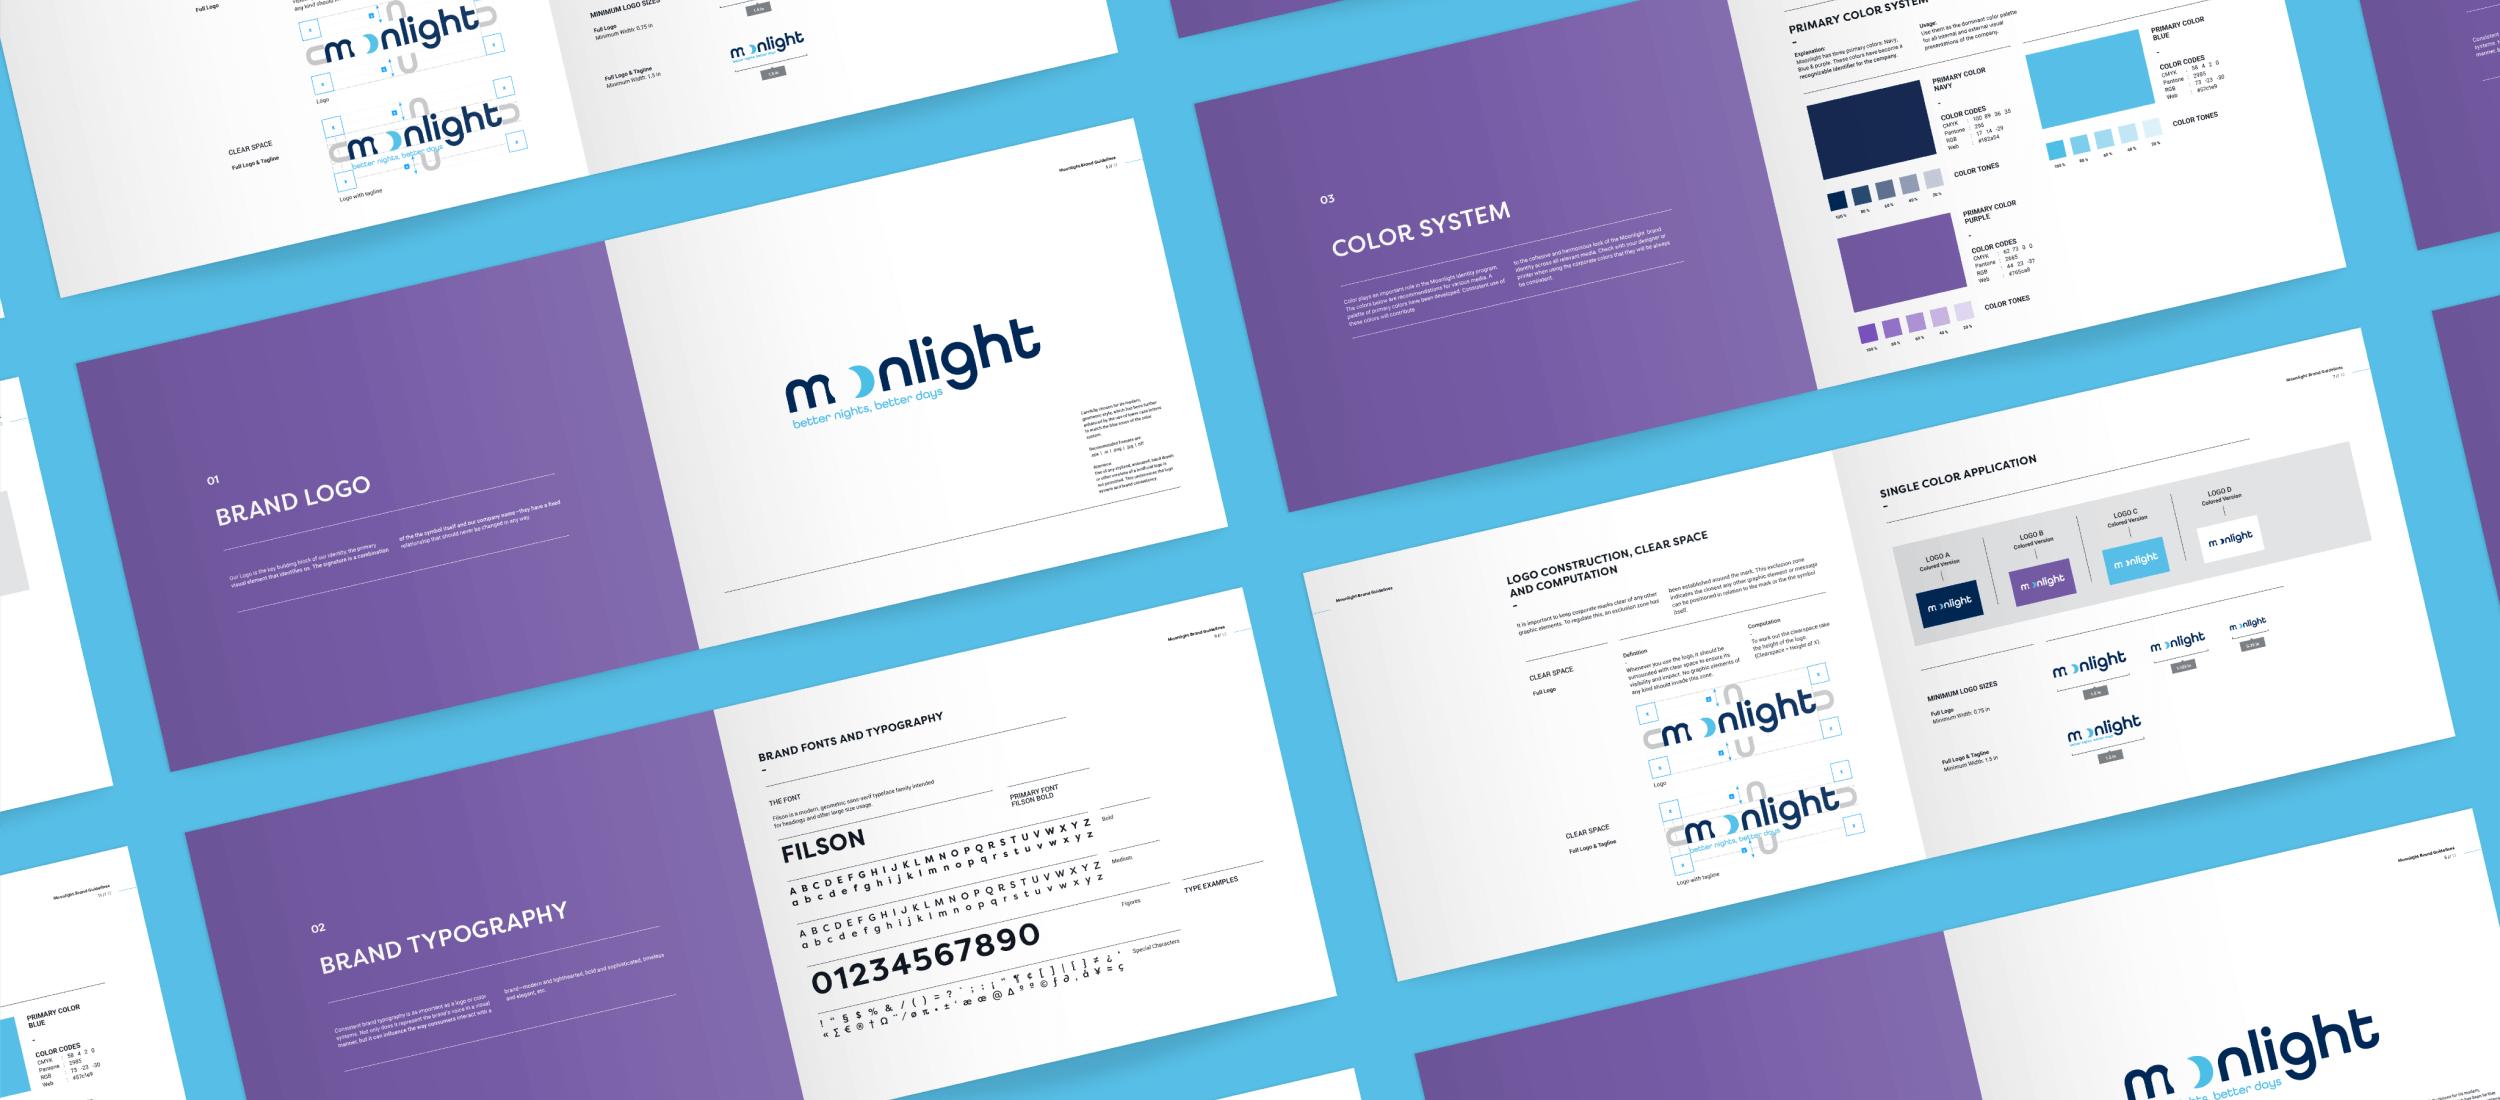 Moonlight's visual identity guidelines created by Fenix Strategic Design.